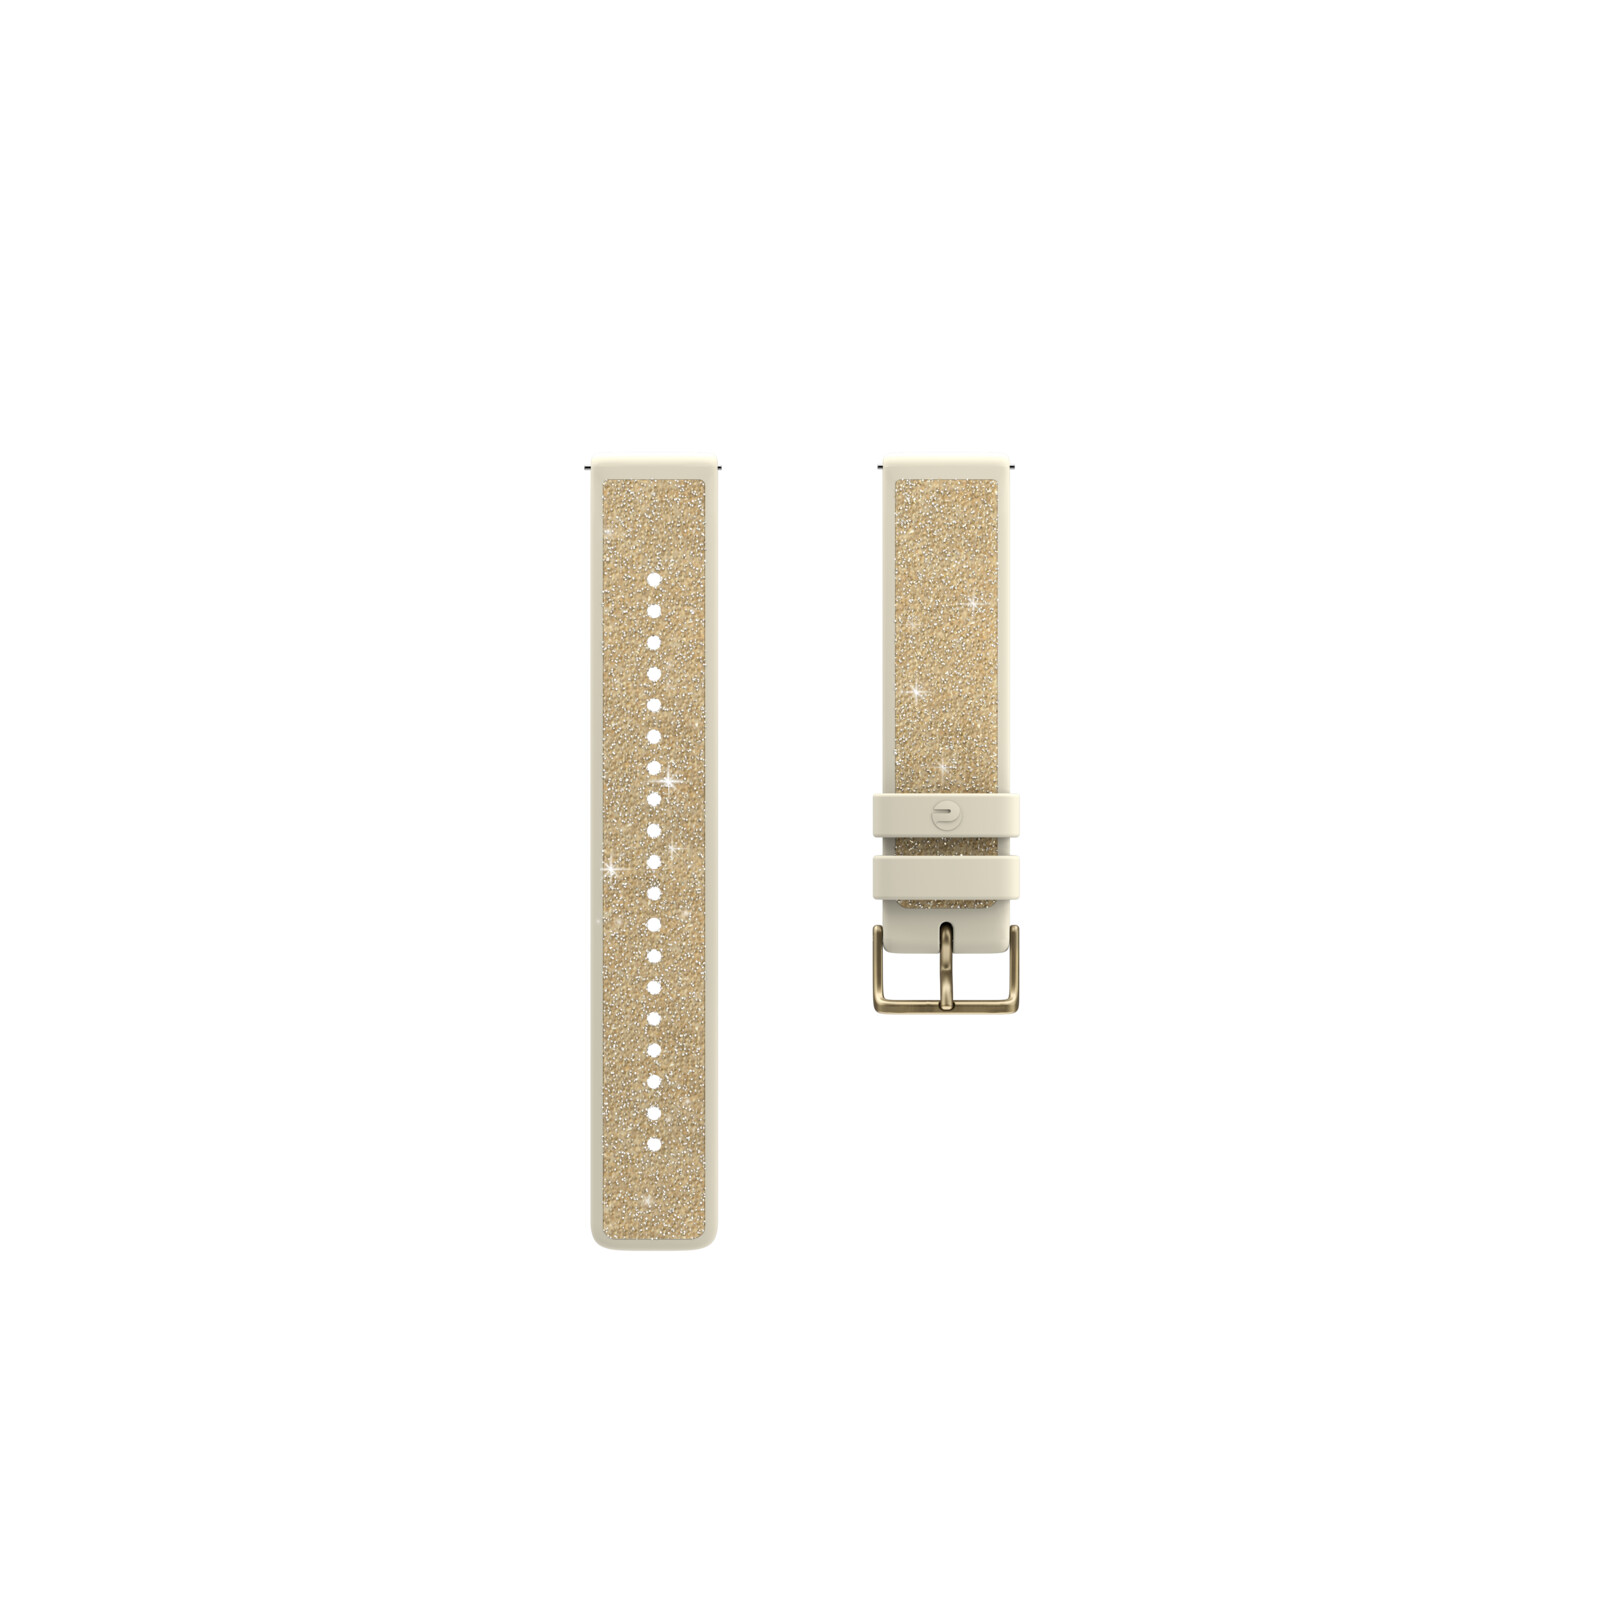 Polar Armband 20mm S FKM/Crystal Gold